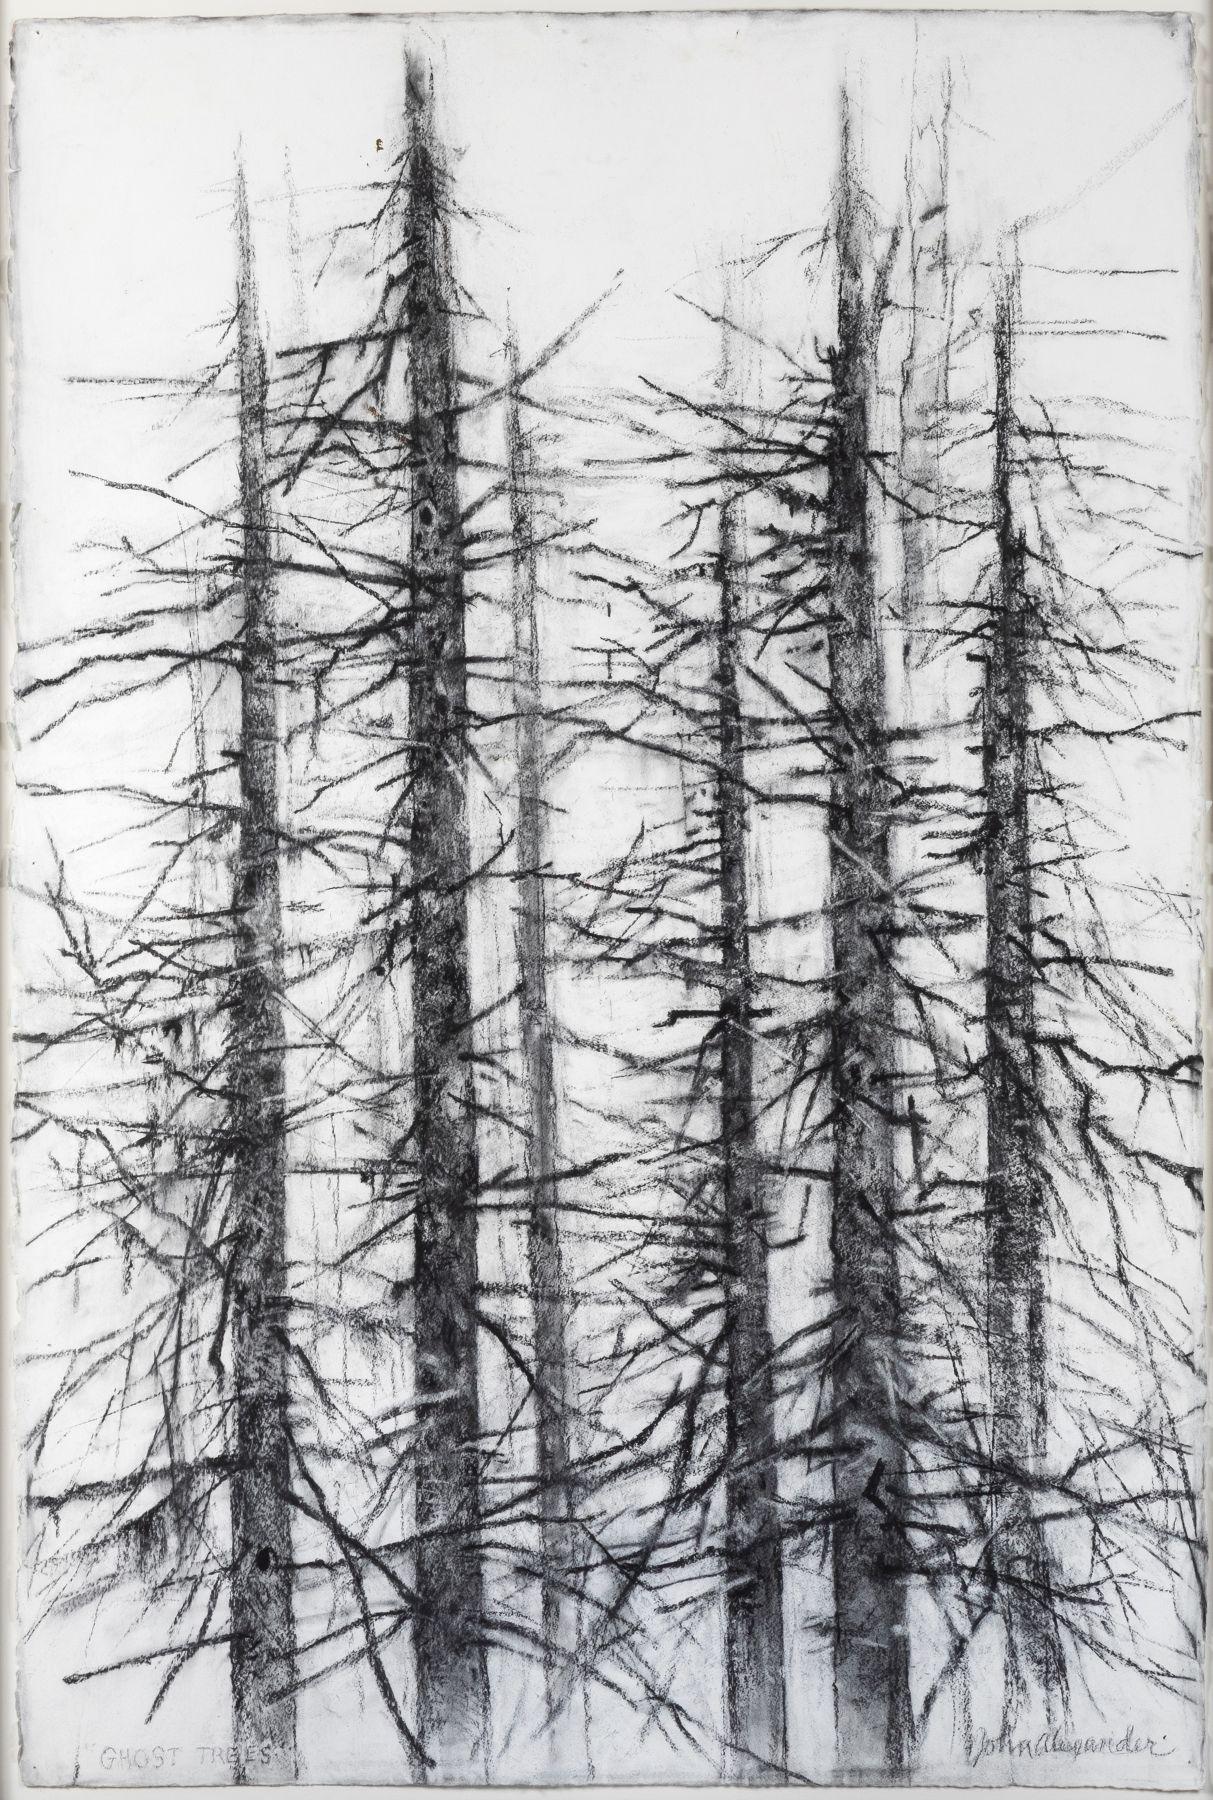 John Alexander Ghost Trees, 2019